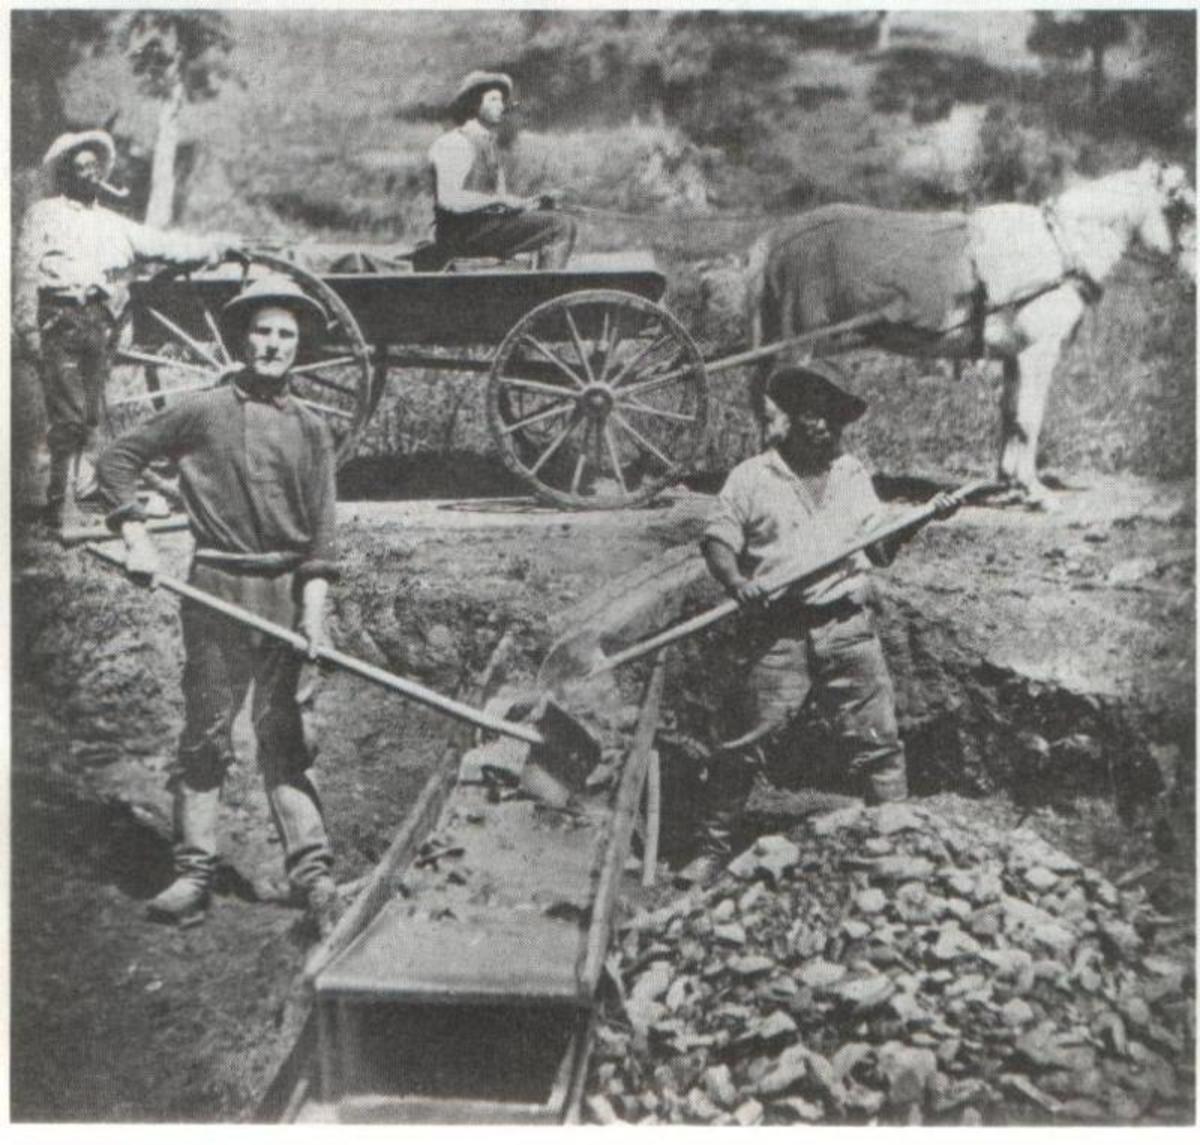 Oklahoma Treasure: Searching for Gold in California